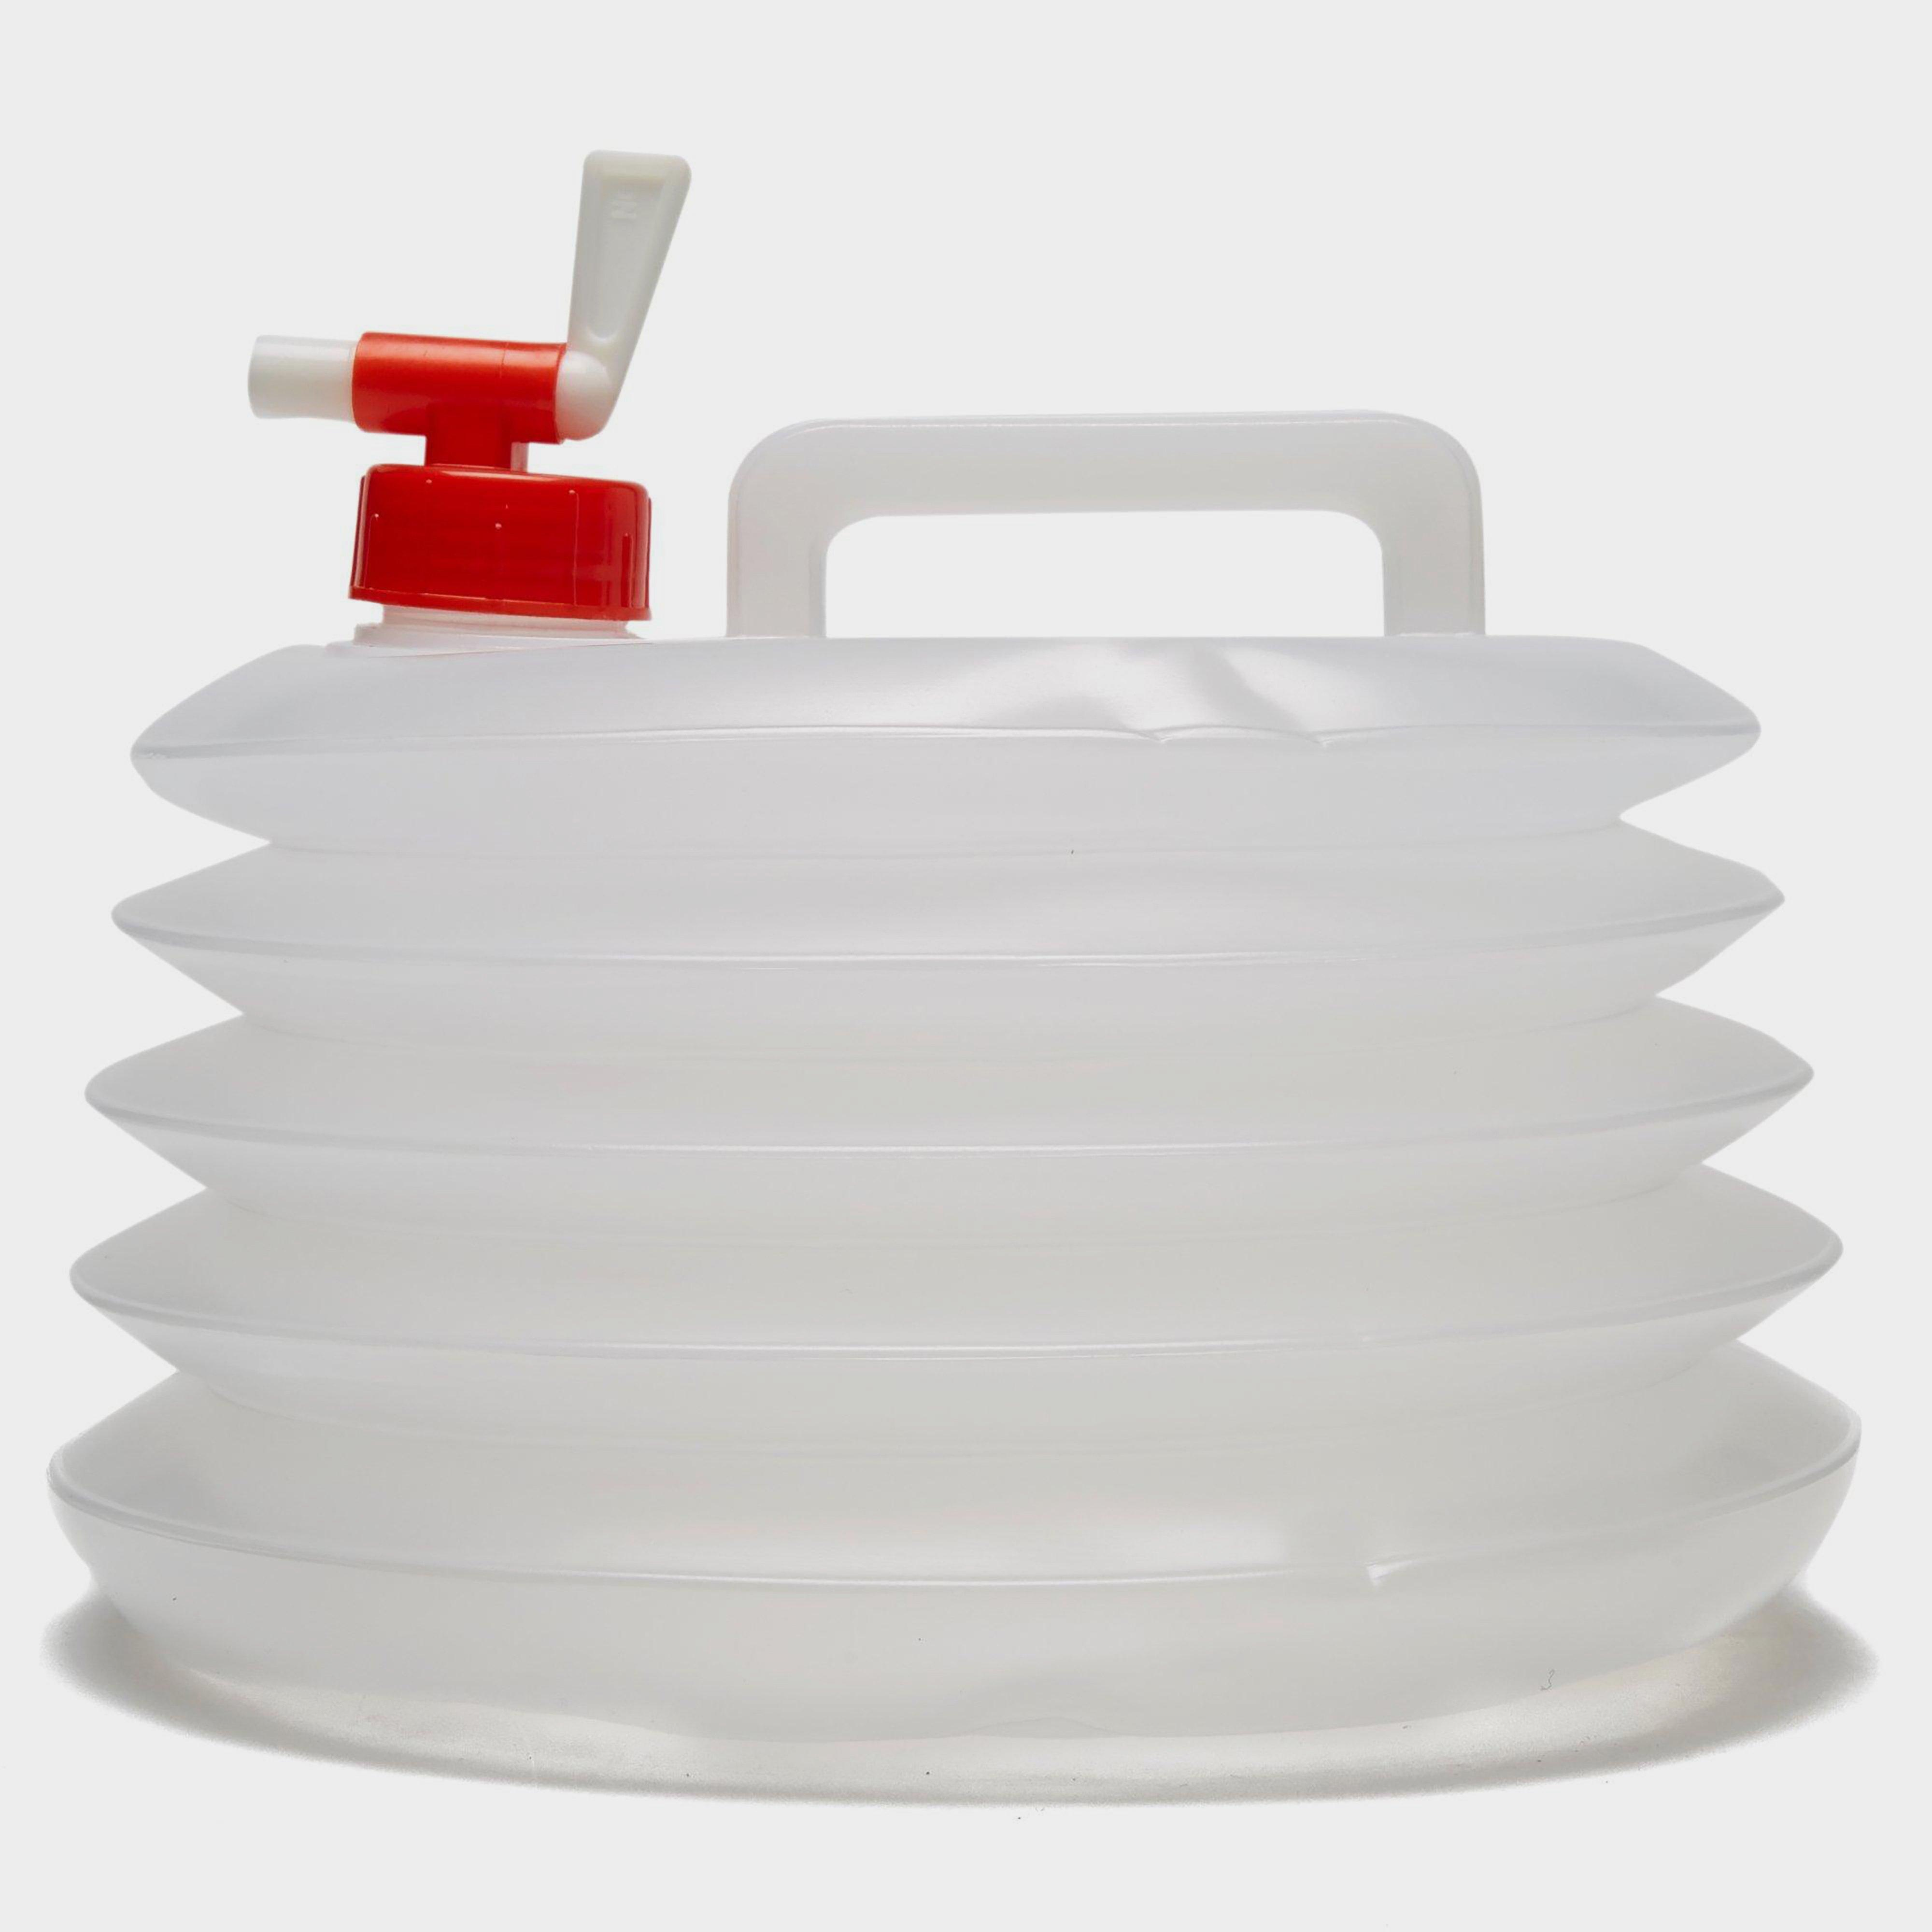 Vango Foldable 8 Litre Water Carrier White